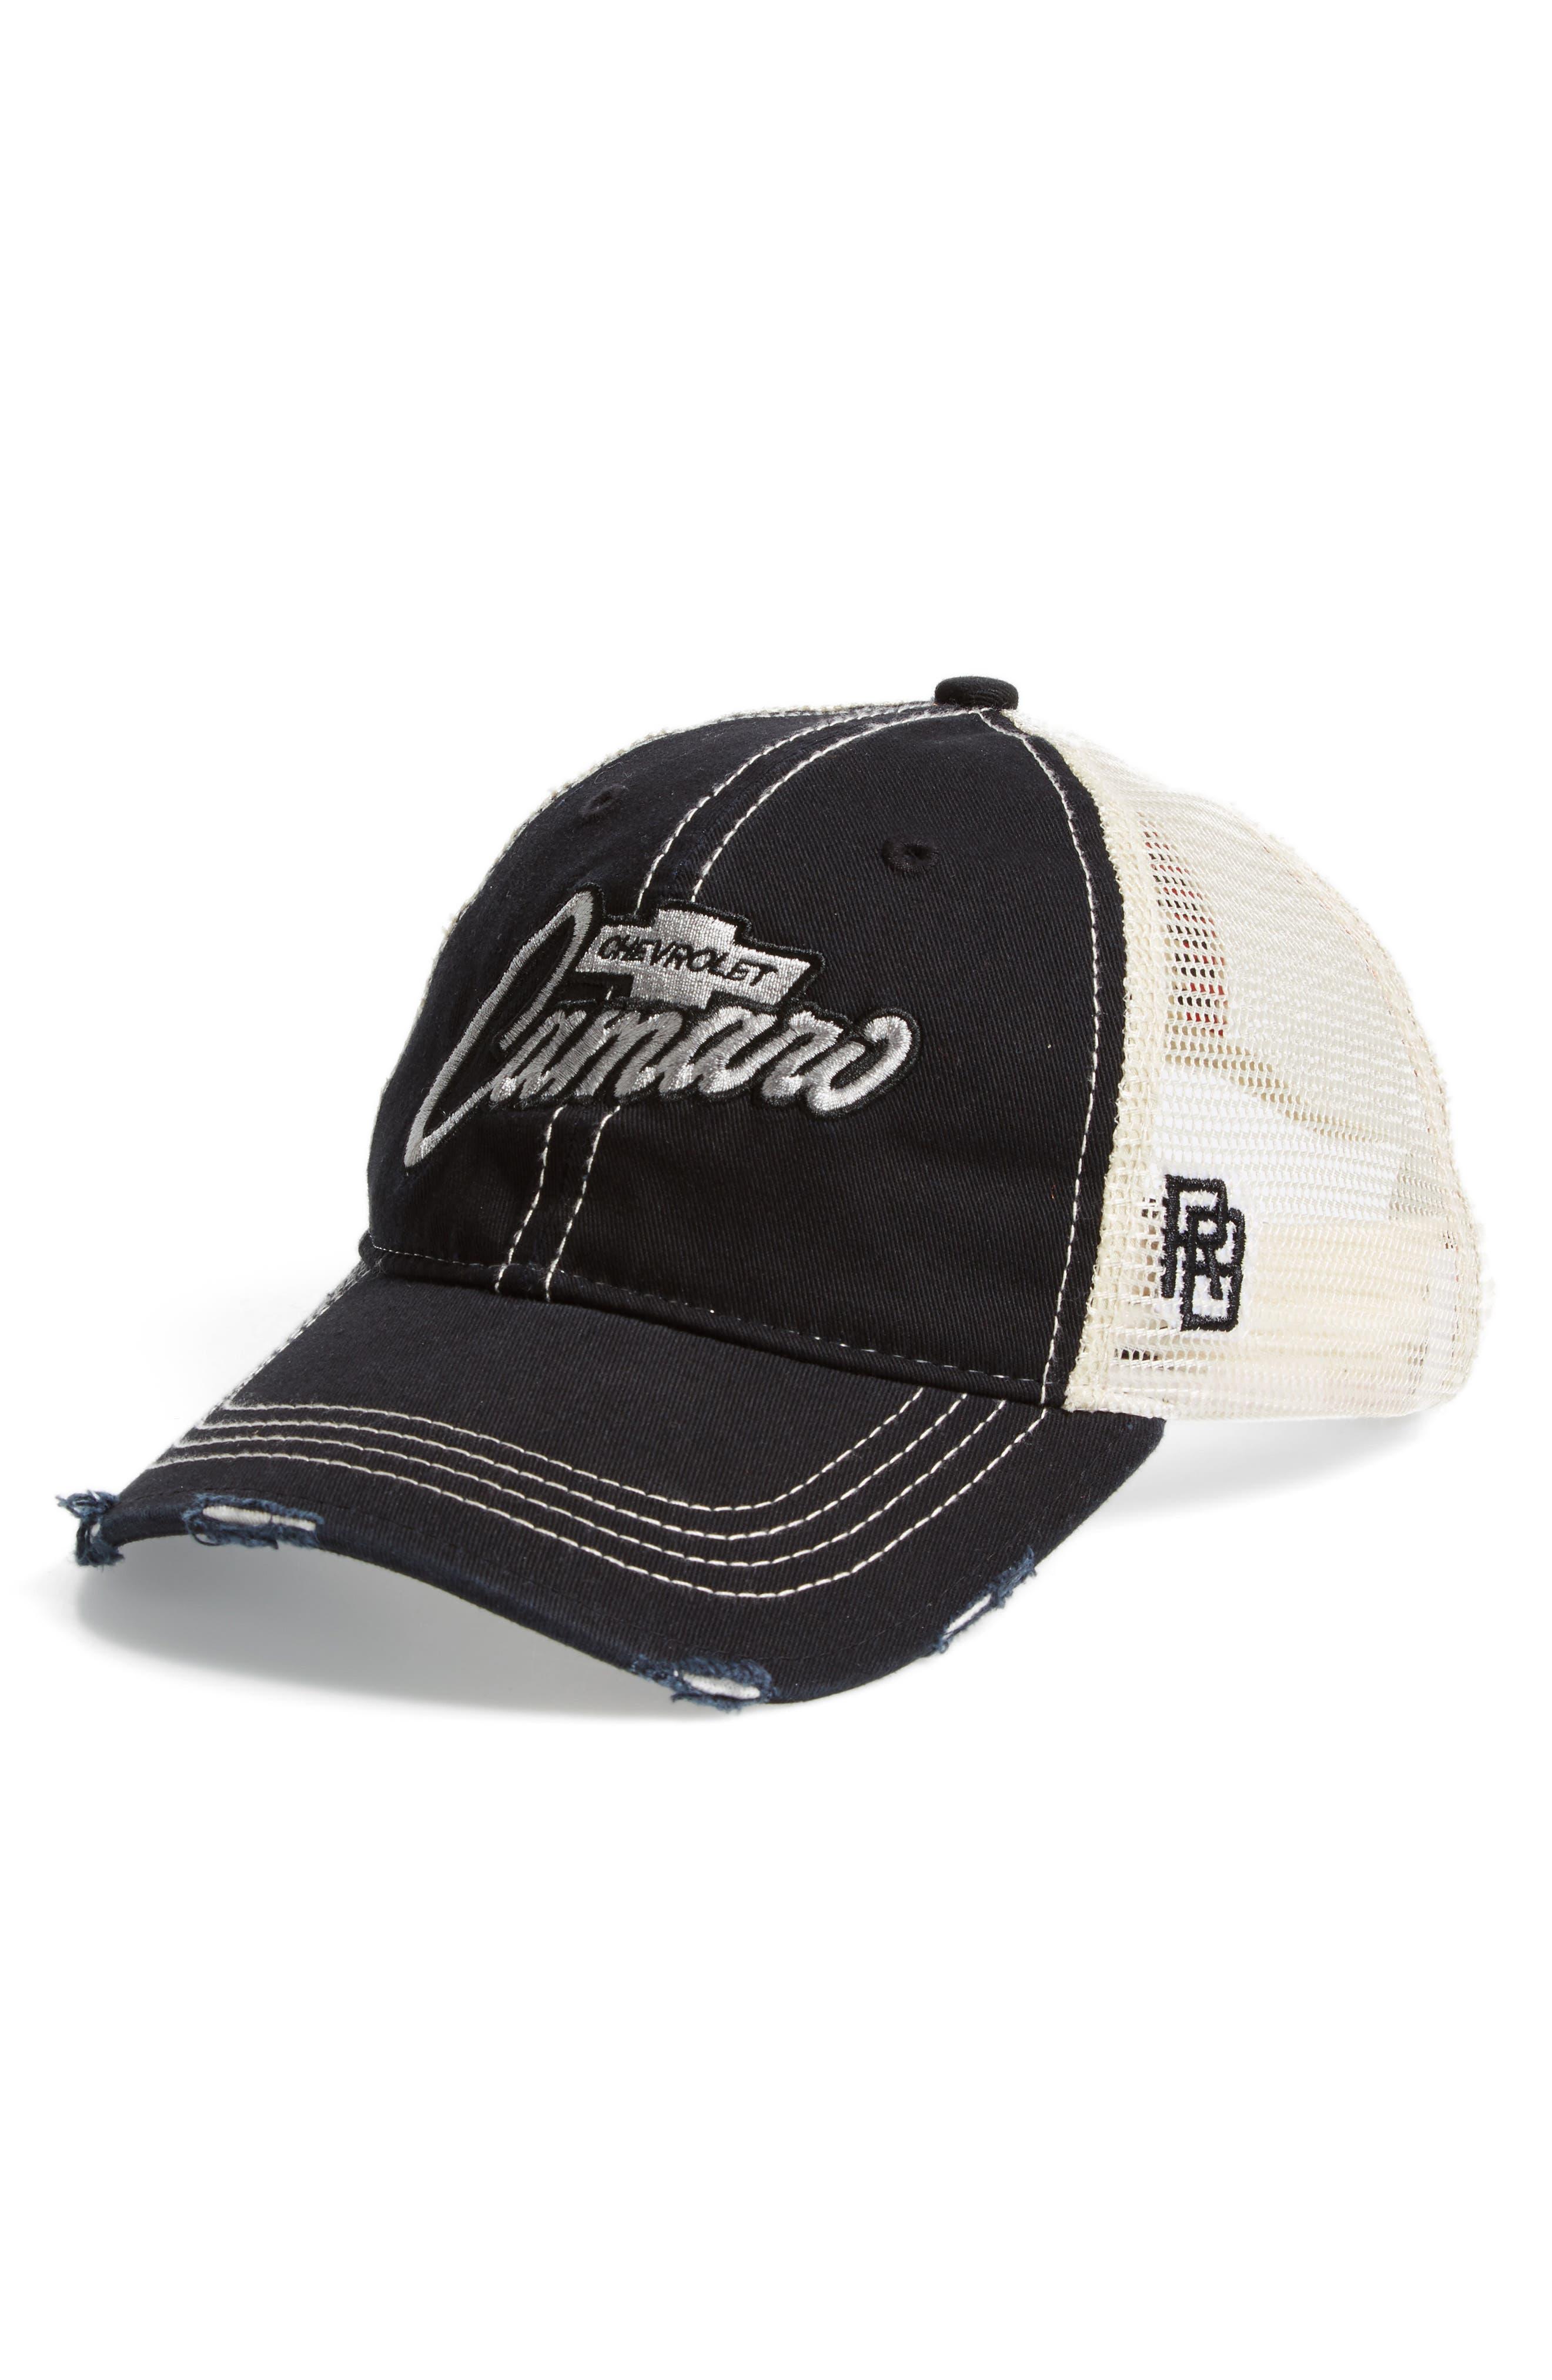 RETRO BRAND Original Retro Brand Camaro Trucker Hat